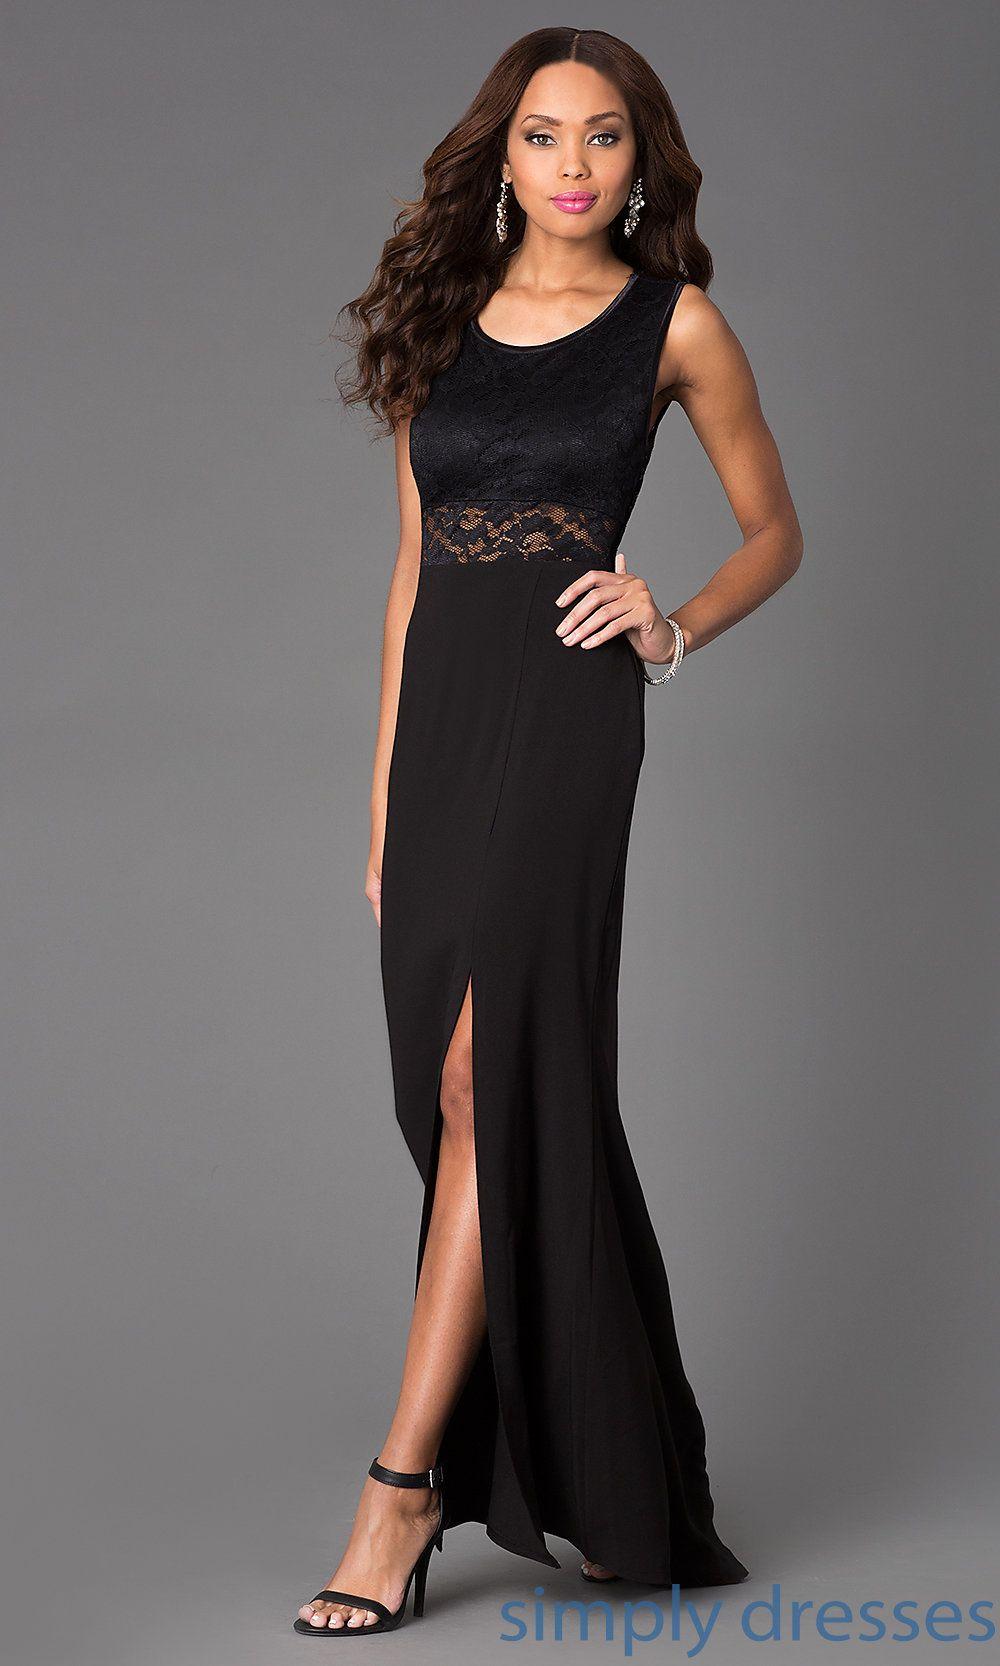 Dress floor length scoop neck lace embellished dress simply